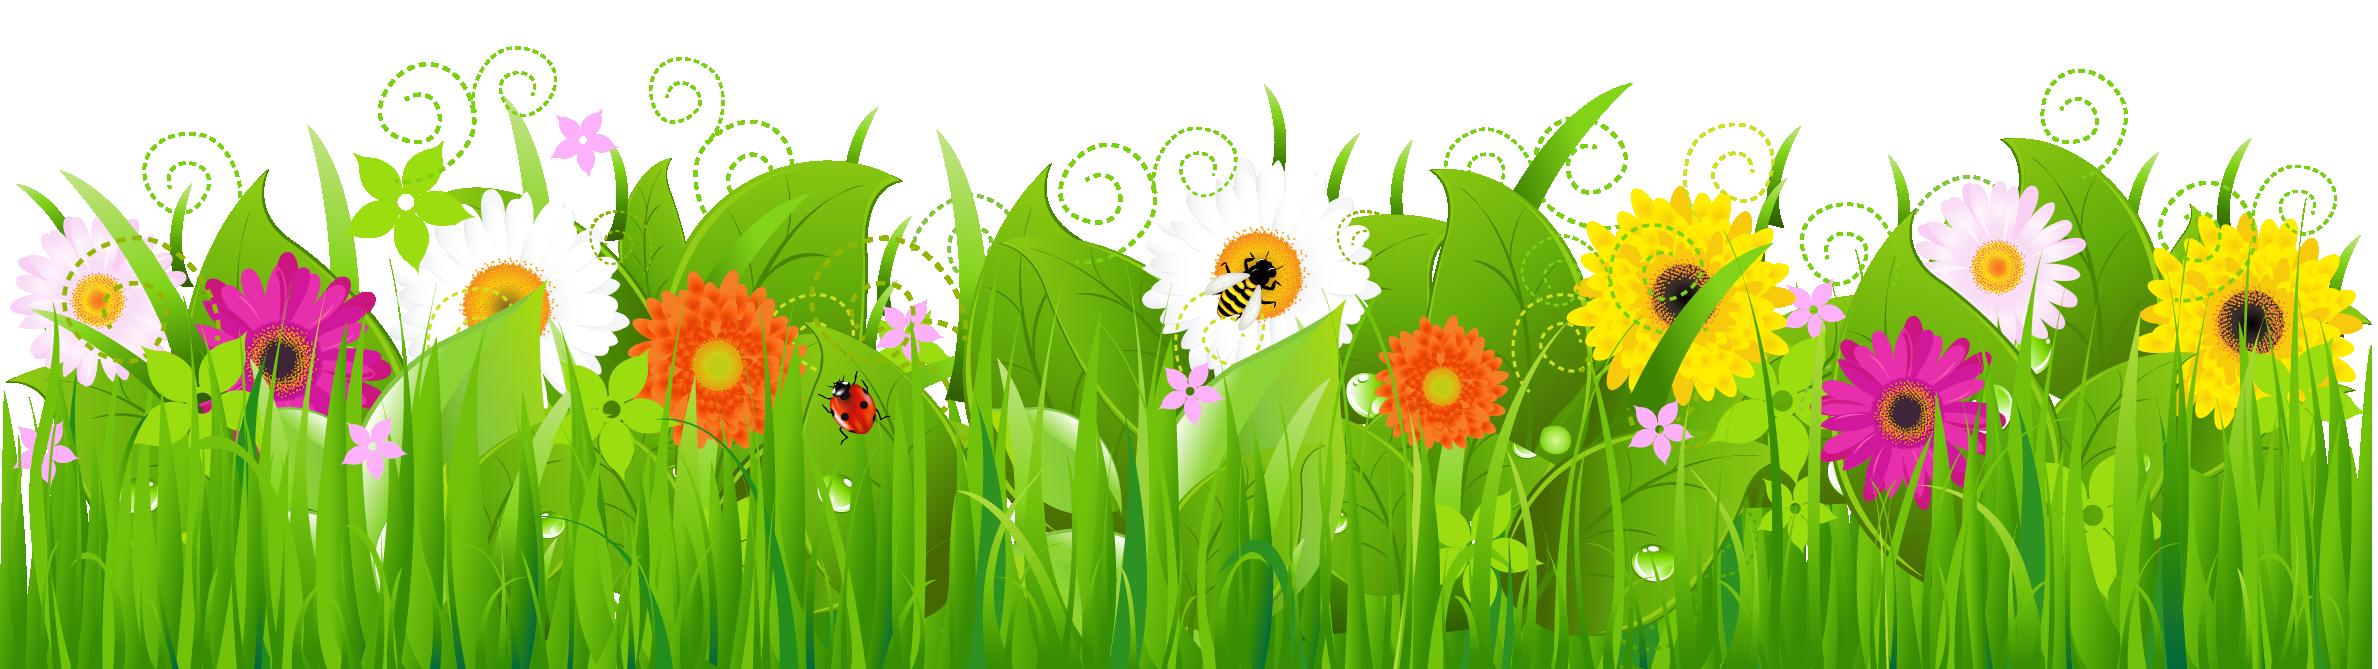 Flowers Free Clip Art Grass Clipart Clip-Flowers free clip art grass clipart clipartbold clipartall-1